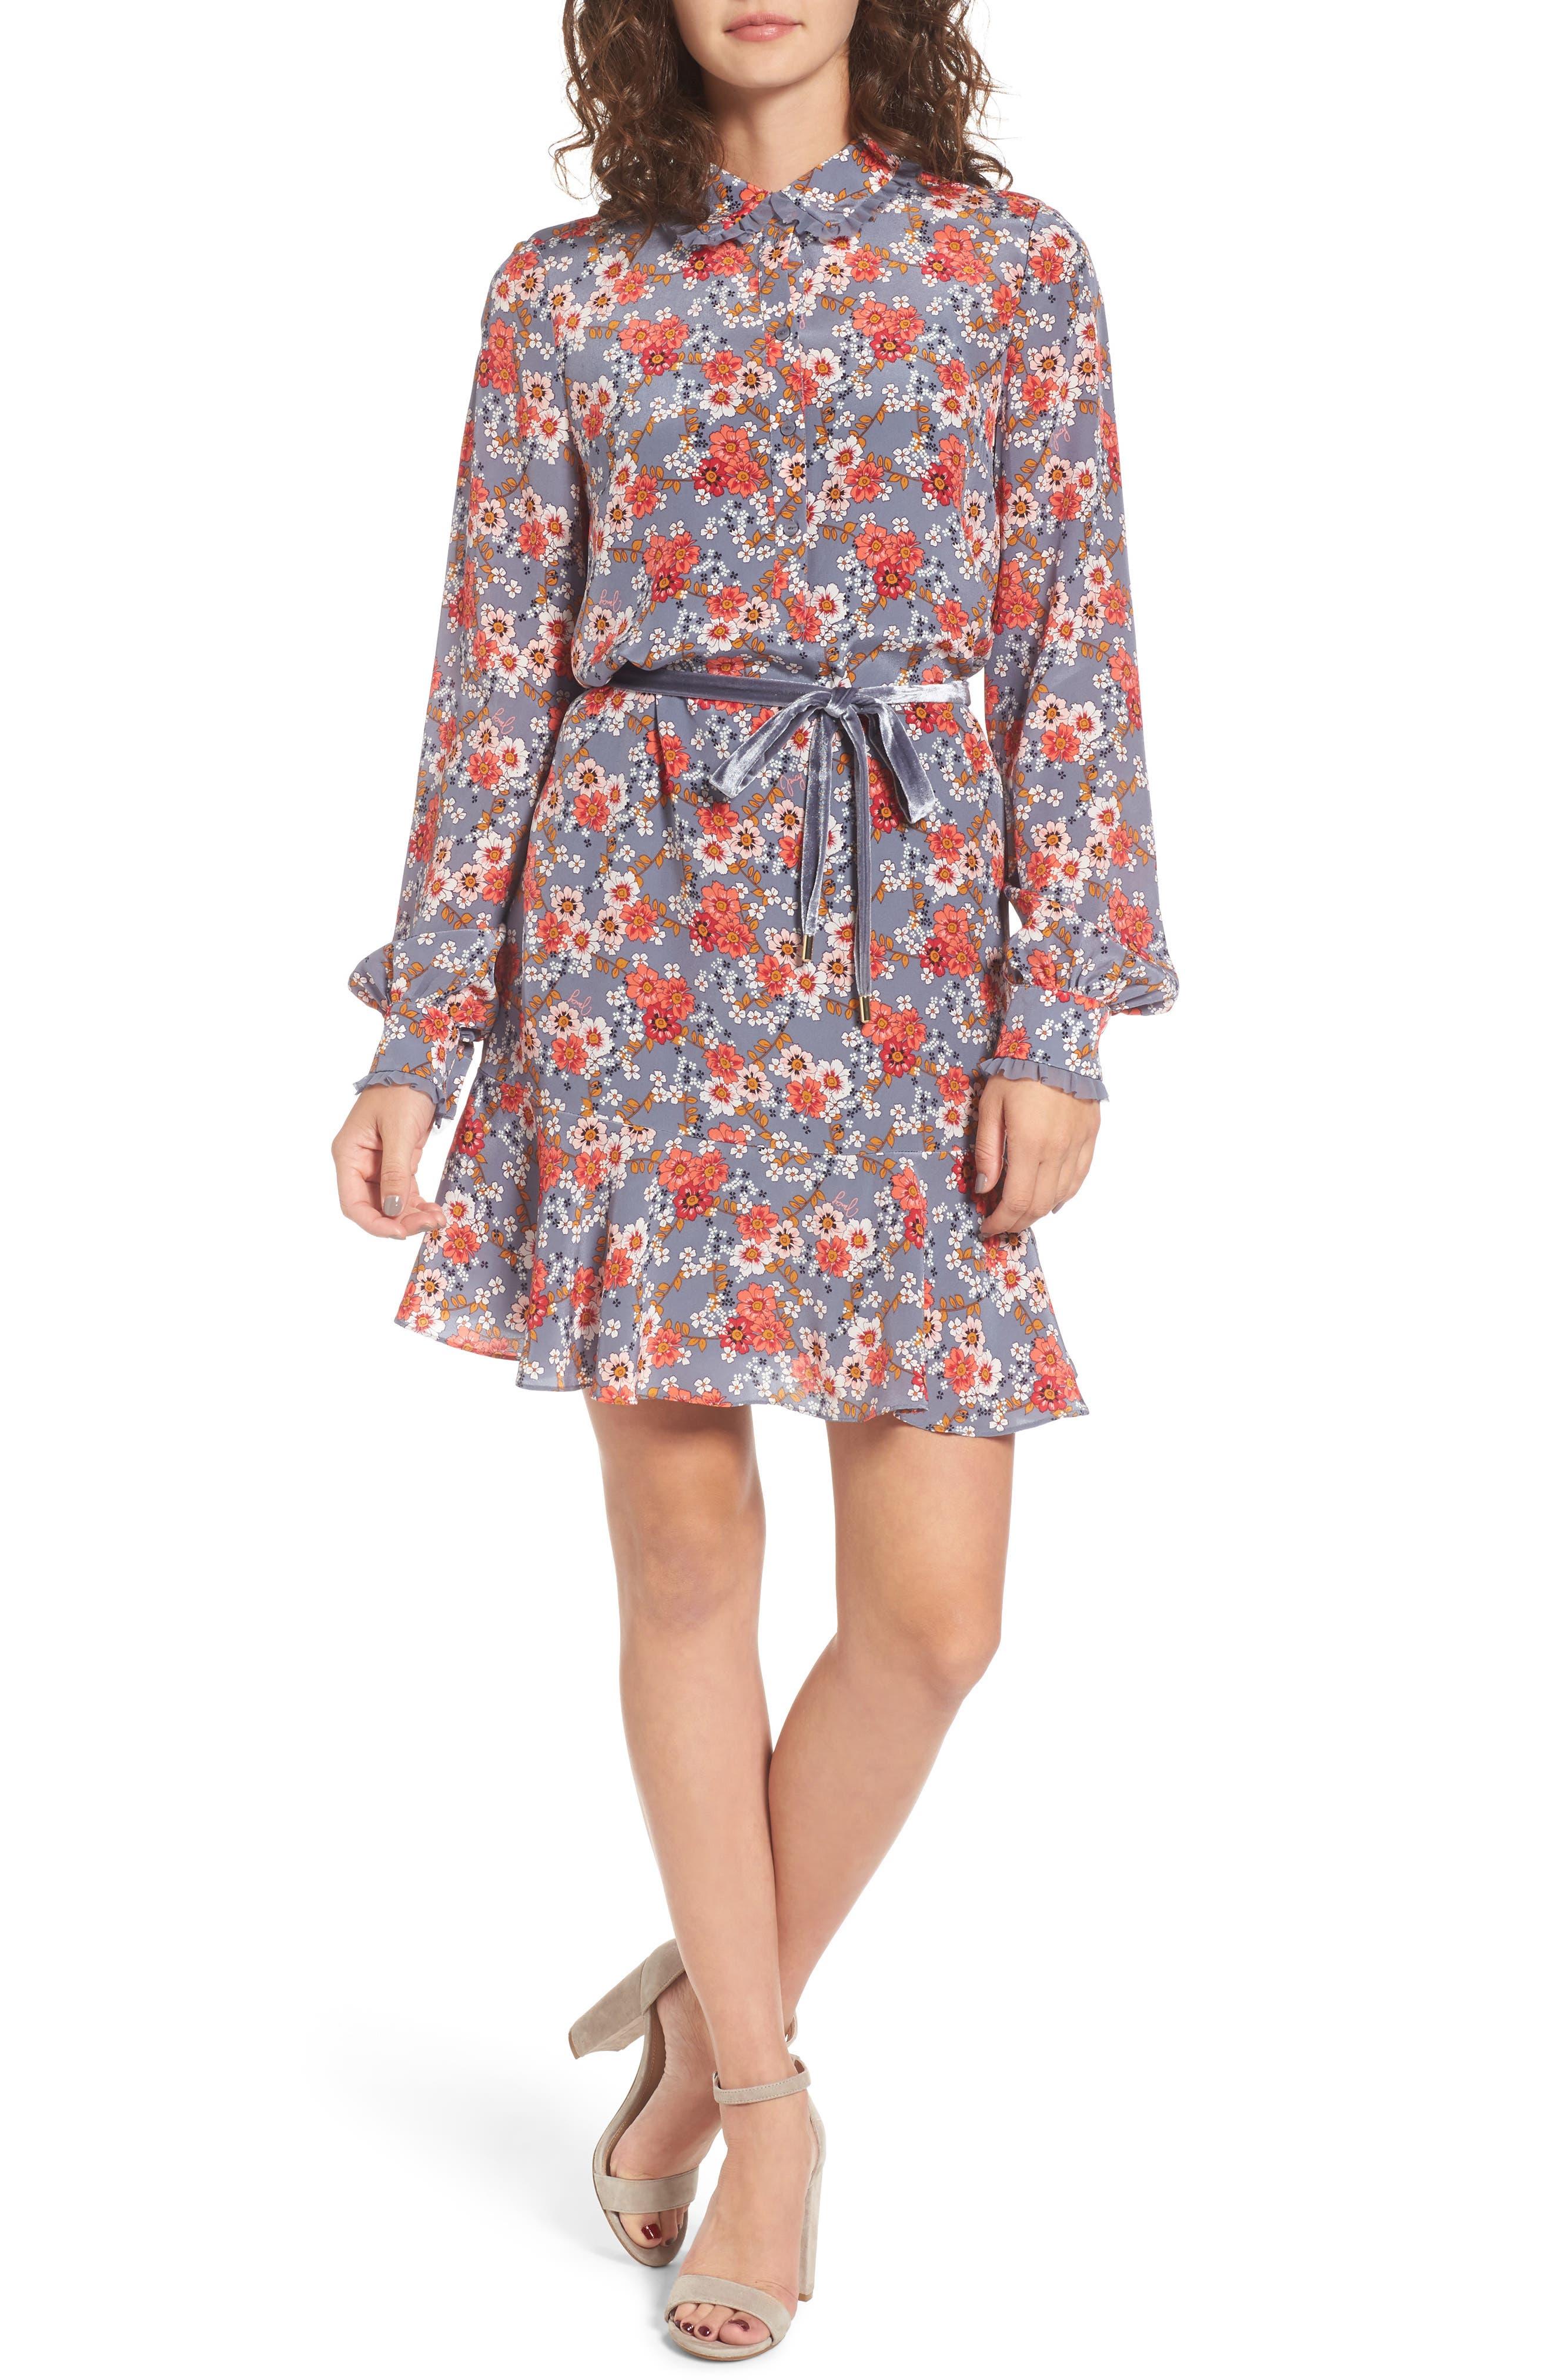 Main Image - Juicy Couture Larchmont Blooms Silk Shirtdress